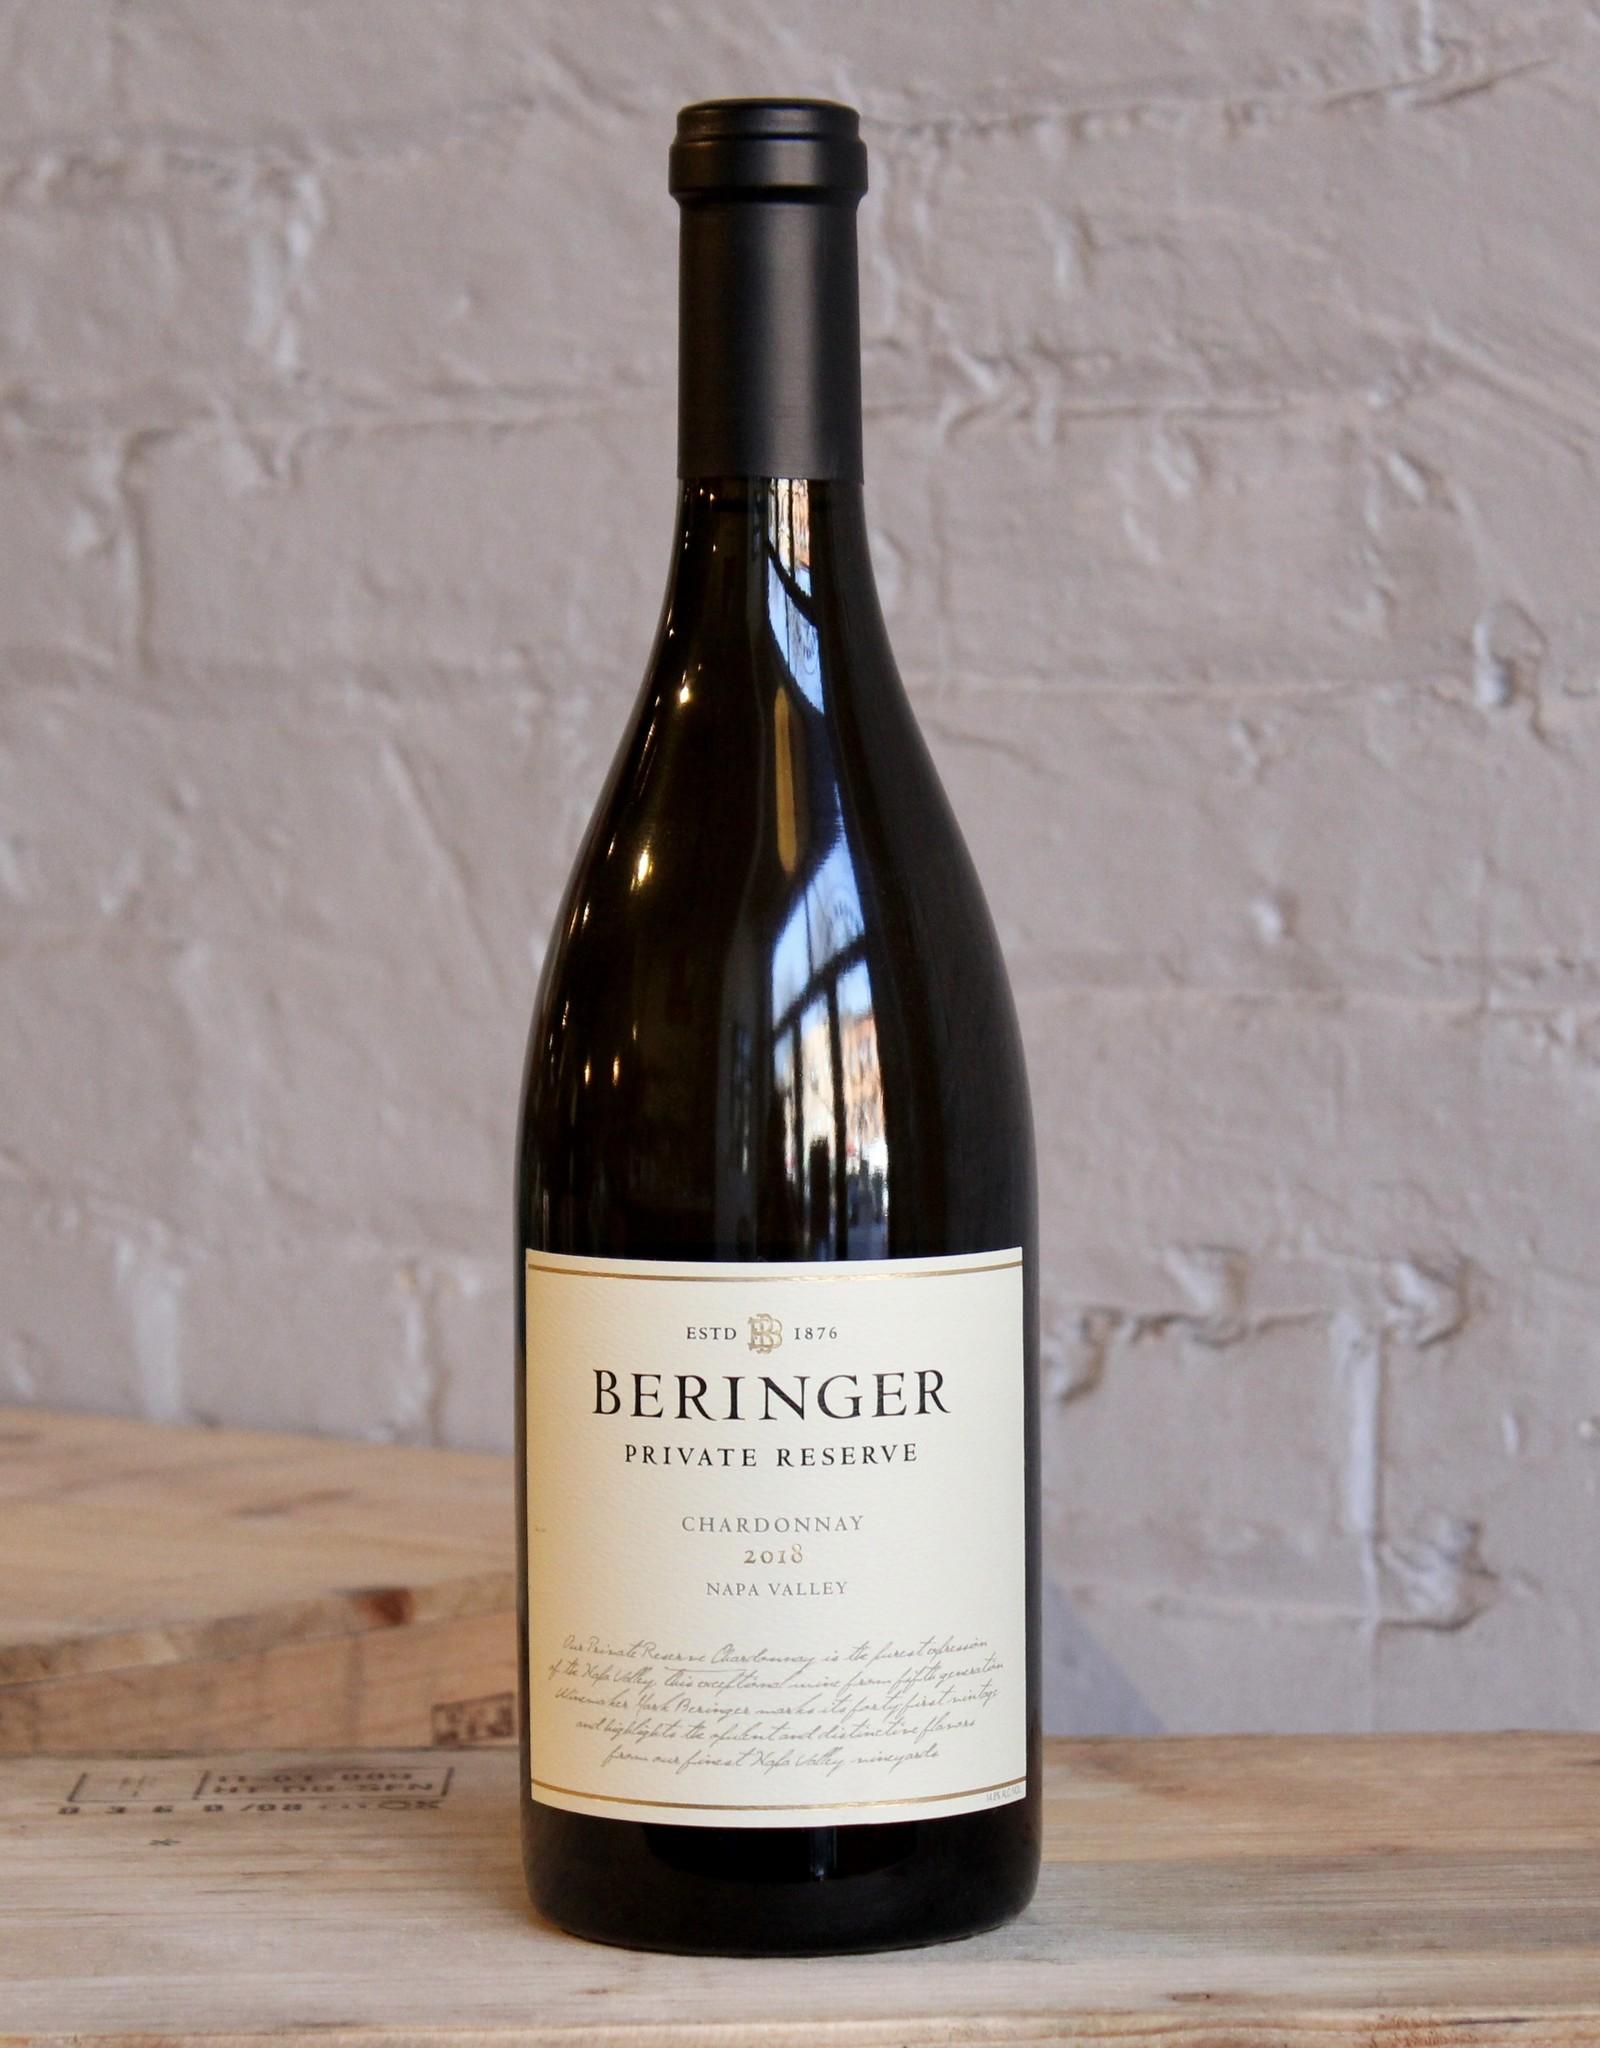 Wine 2018 Beringer Chardonnay Private Reserve - Napa Valley, CA (750ml)